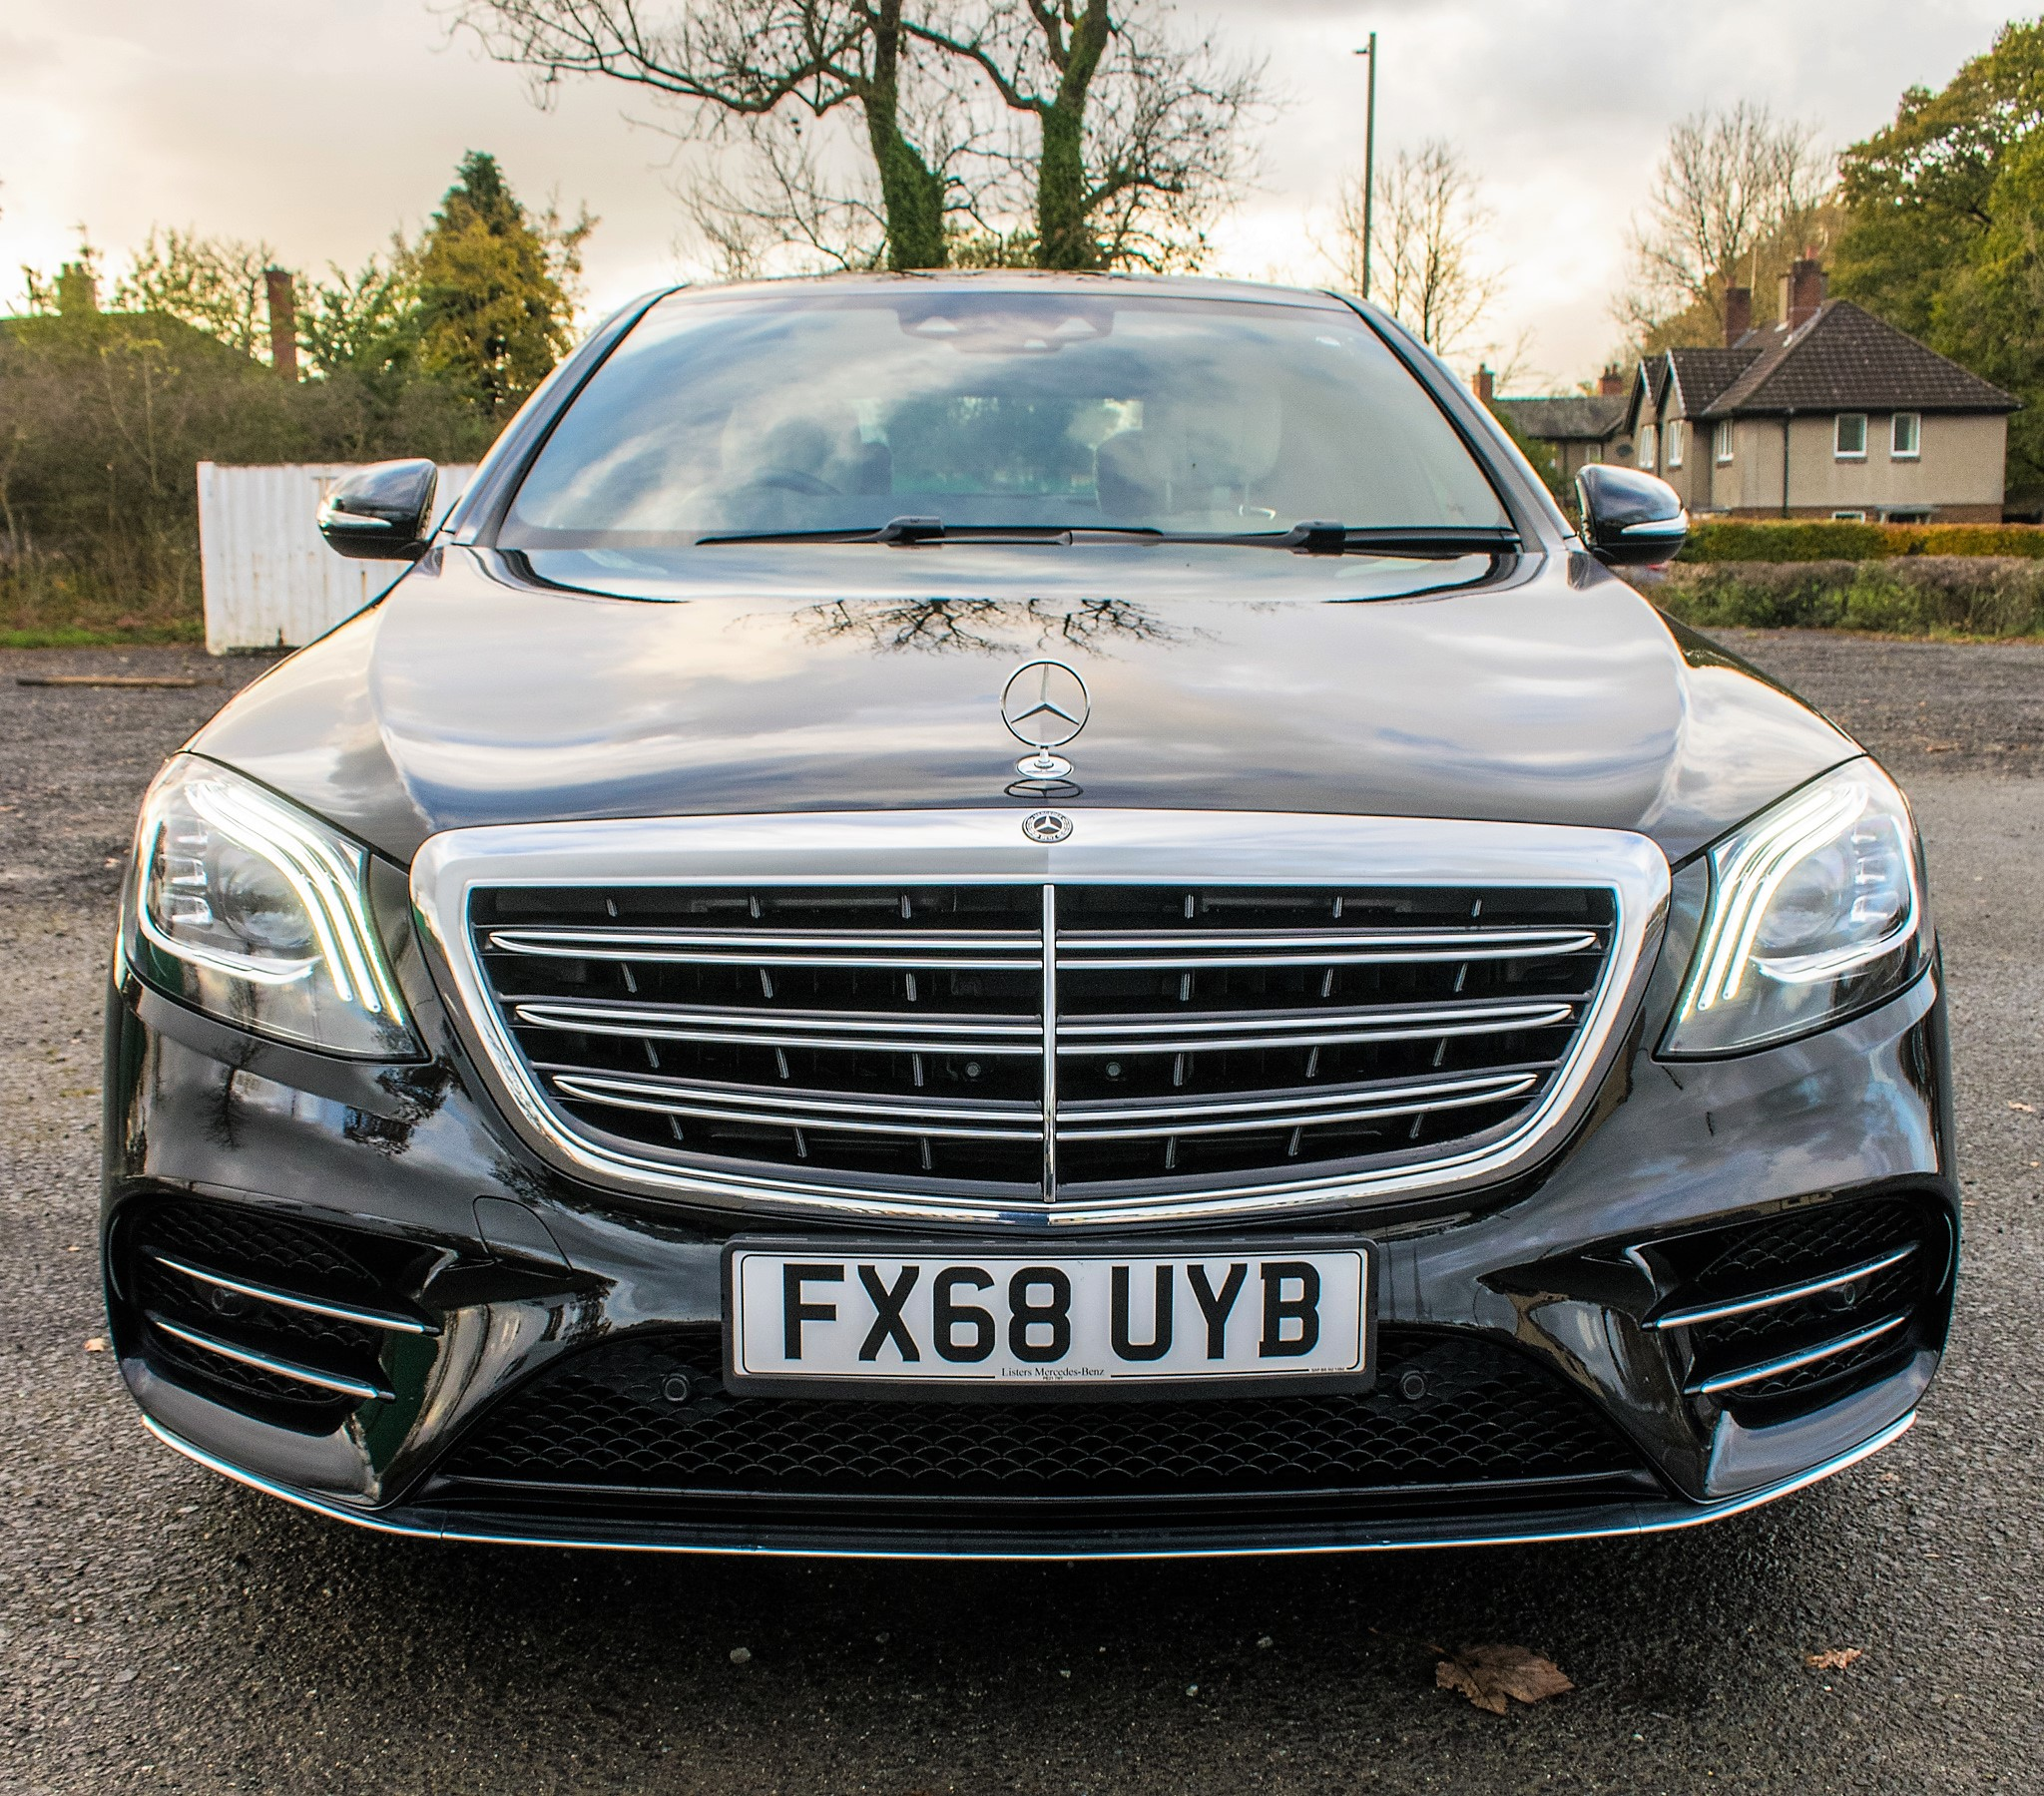 Mercedes Benz S450 L AMG Line Executive auto petrol 4 door saloon car Registration Number: FX68 - Image 5 of 33